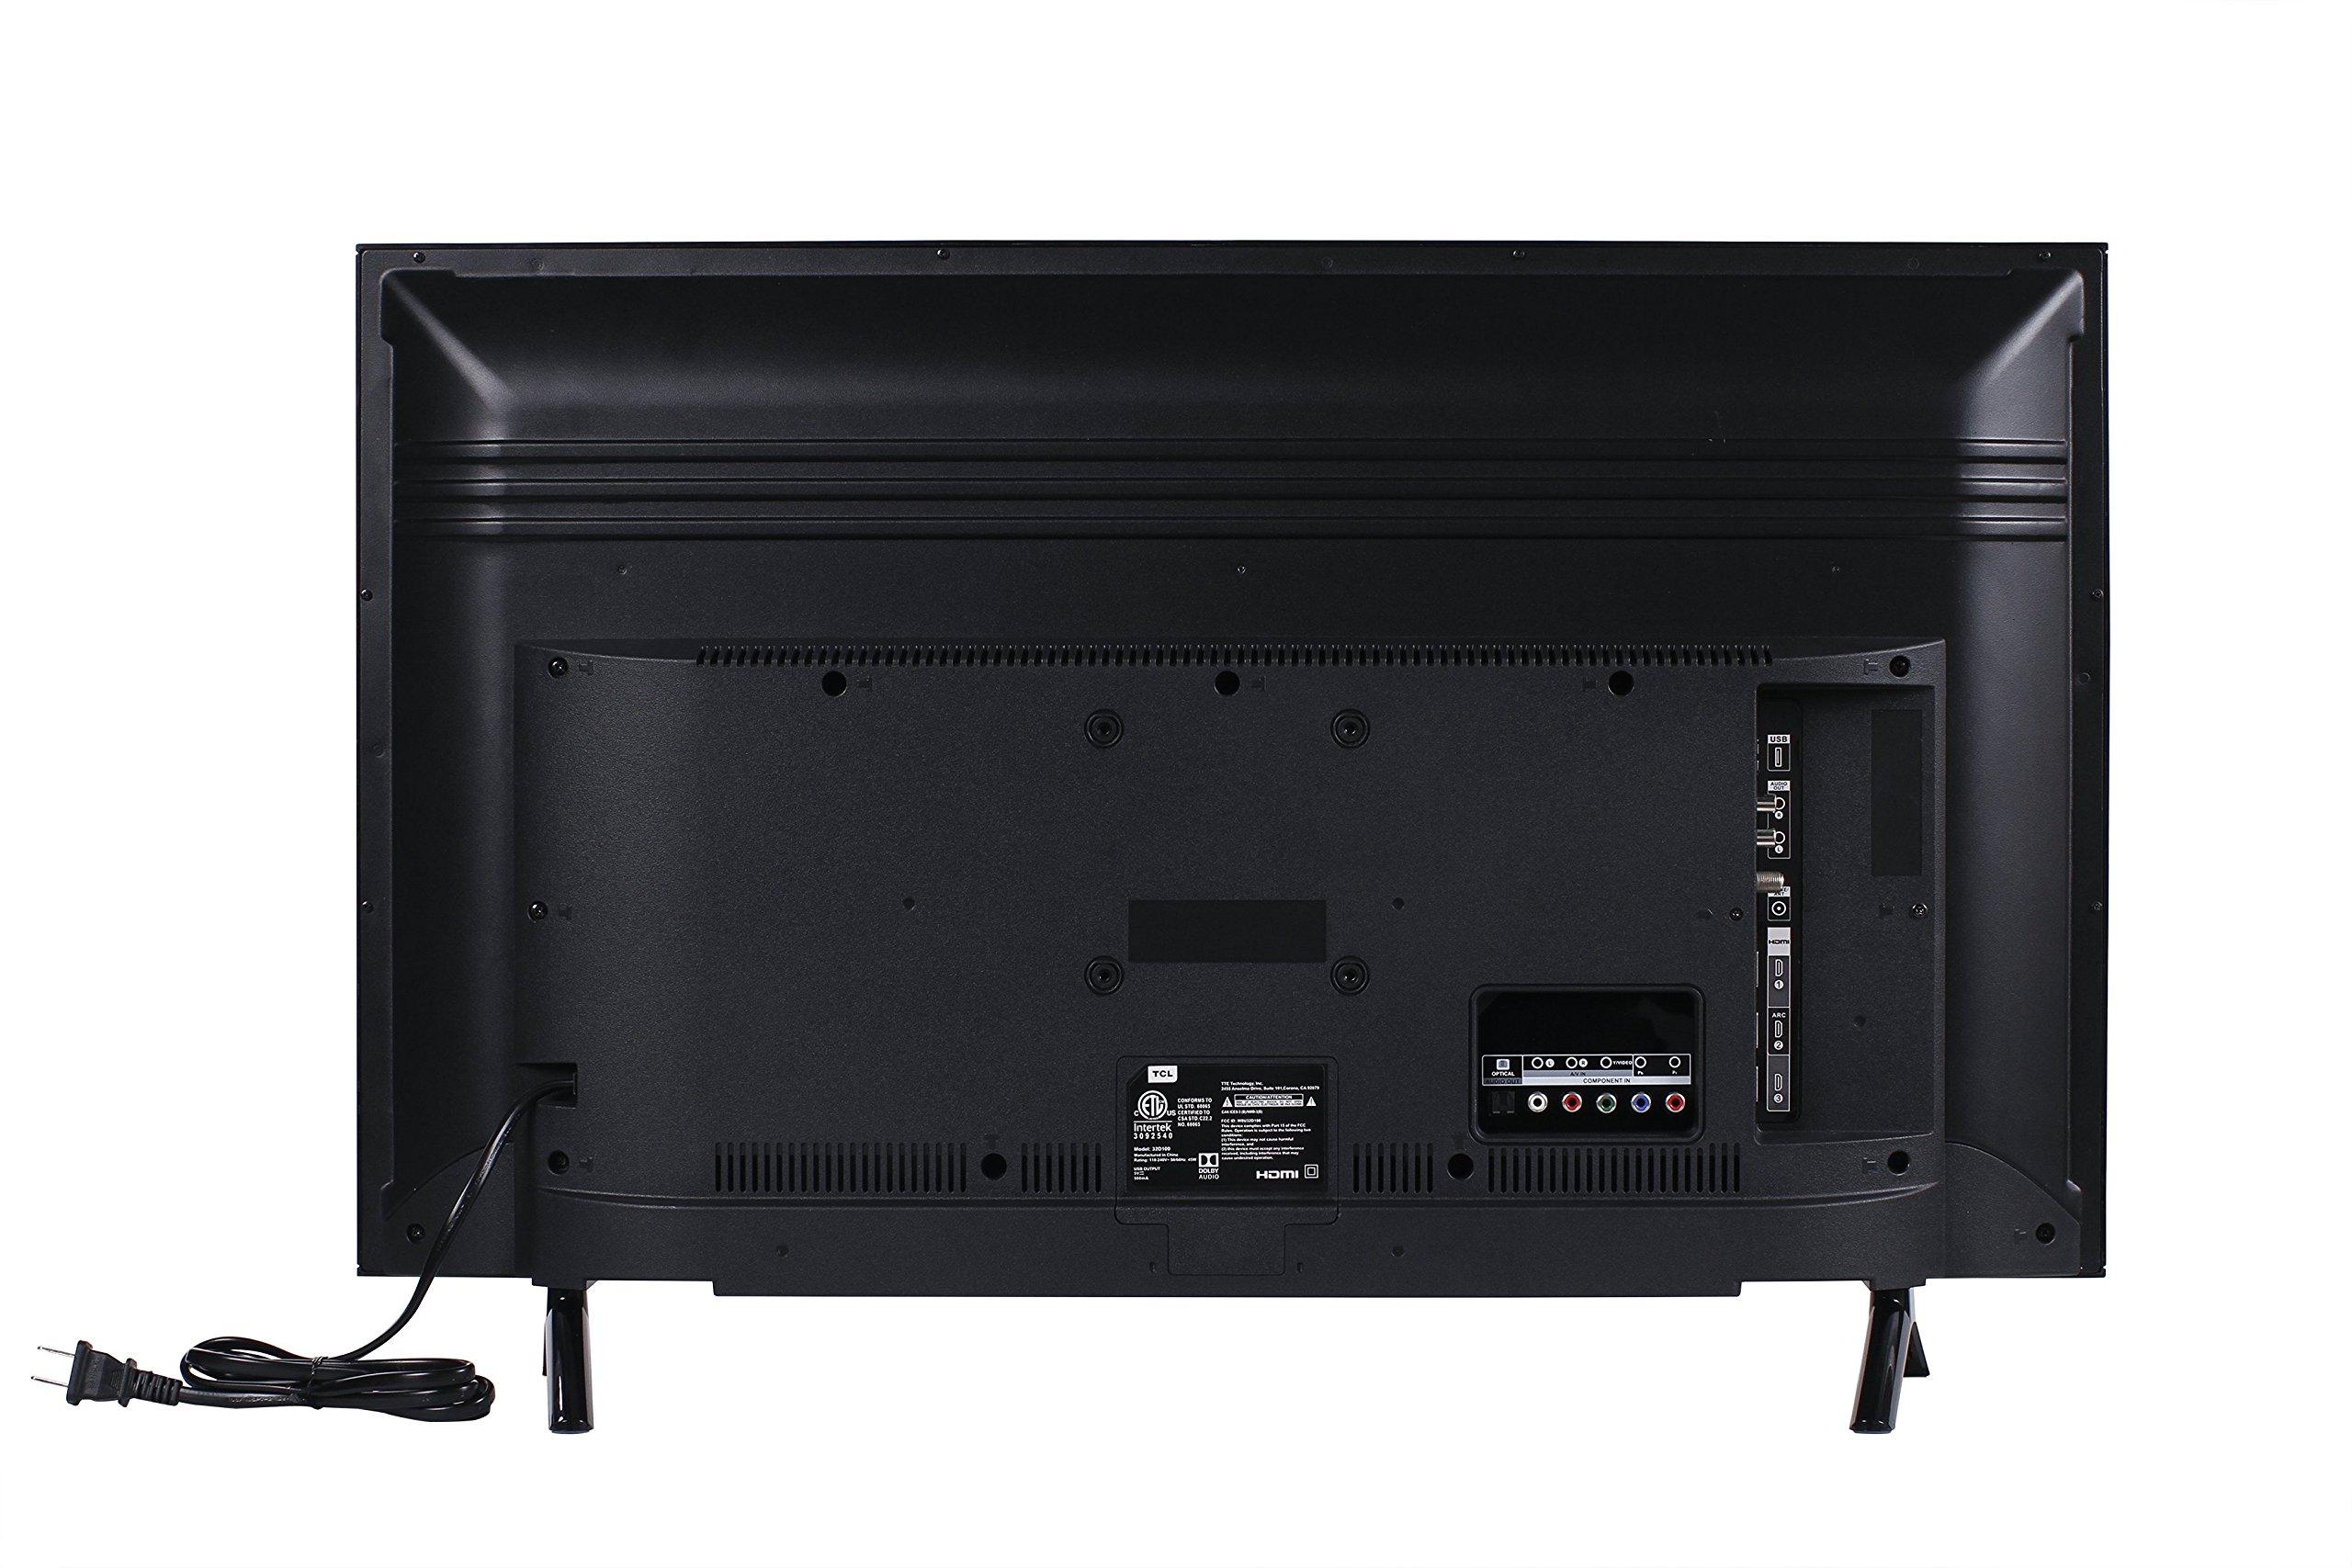 TCL 32'' 720p LED TV (2018) (32D100-B) by TCL (Image #6)